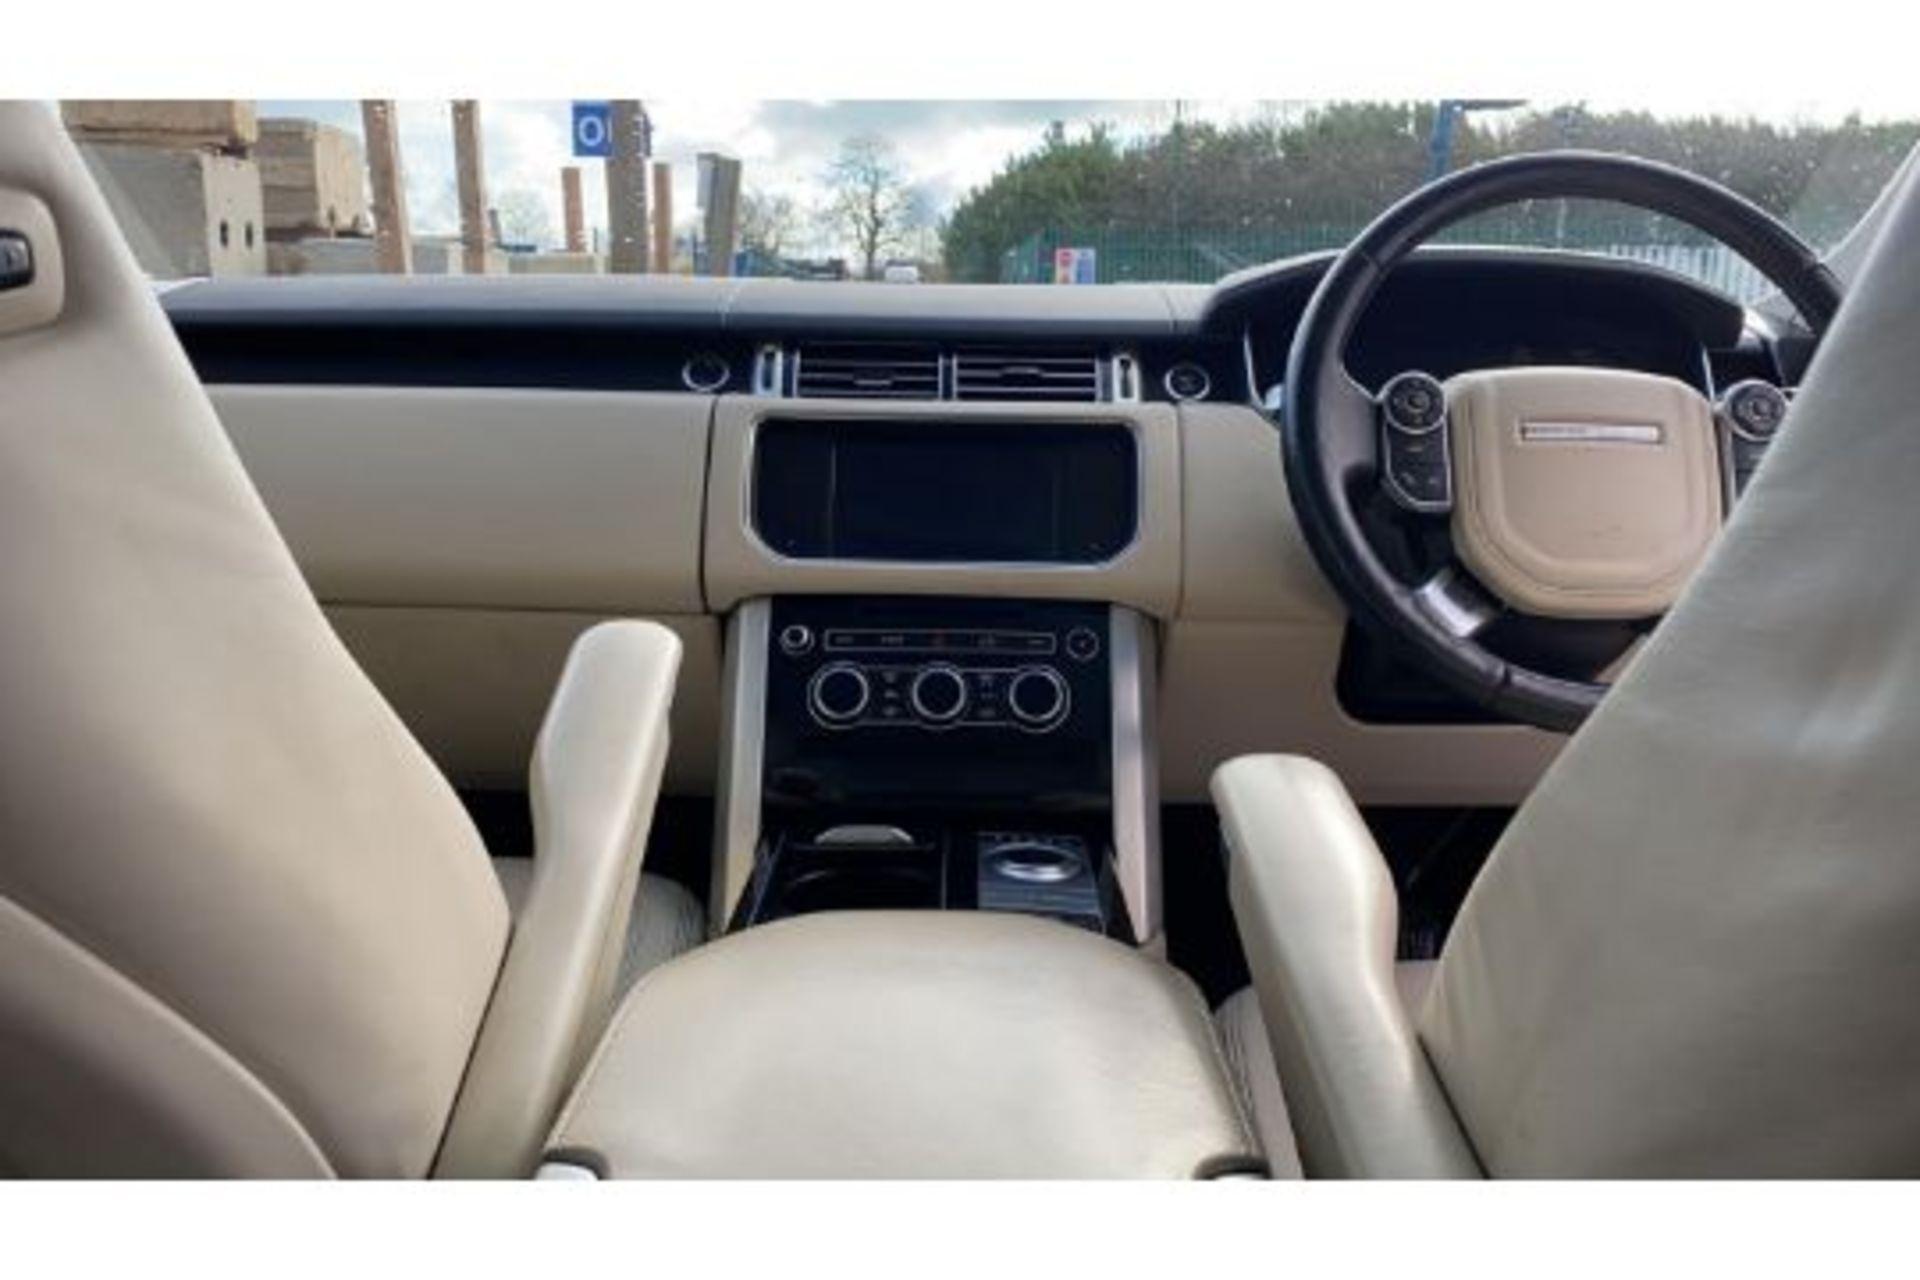 Range Rover Vogue 3.0 TDV6 SE Auto - Black Pack - NEW SHAPE - FULLY LOADED - Pan Roof - Image 14 of 30